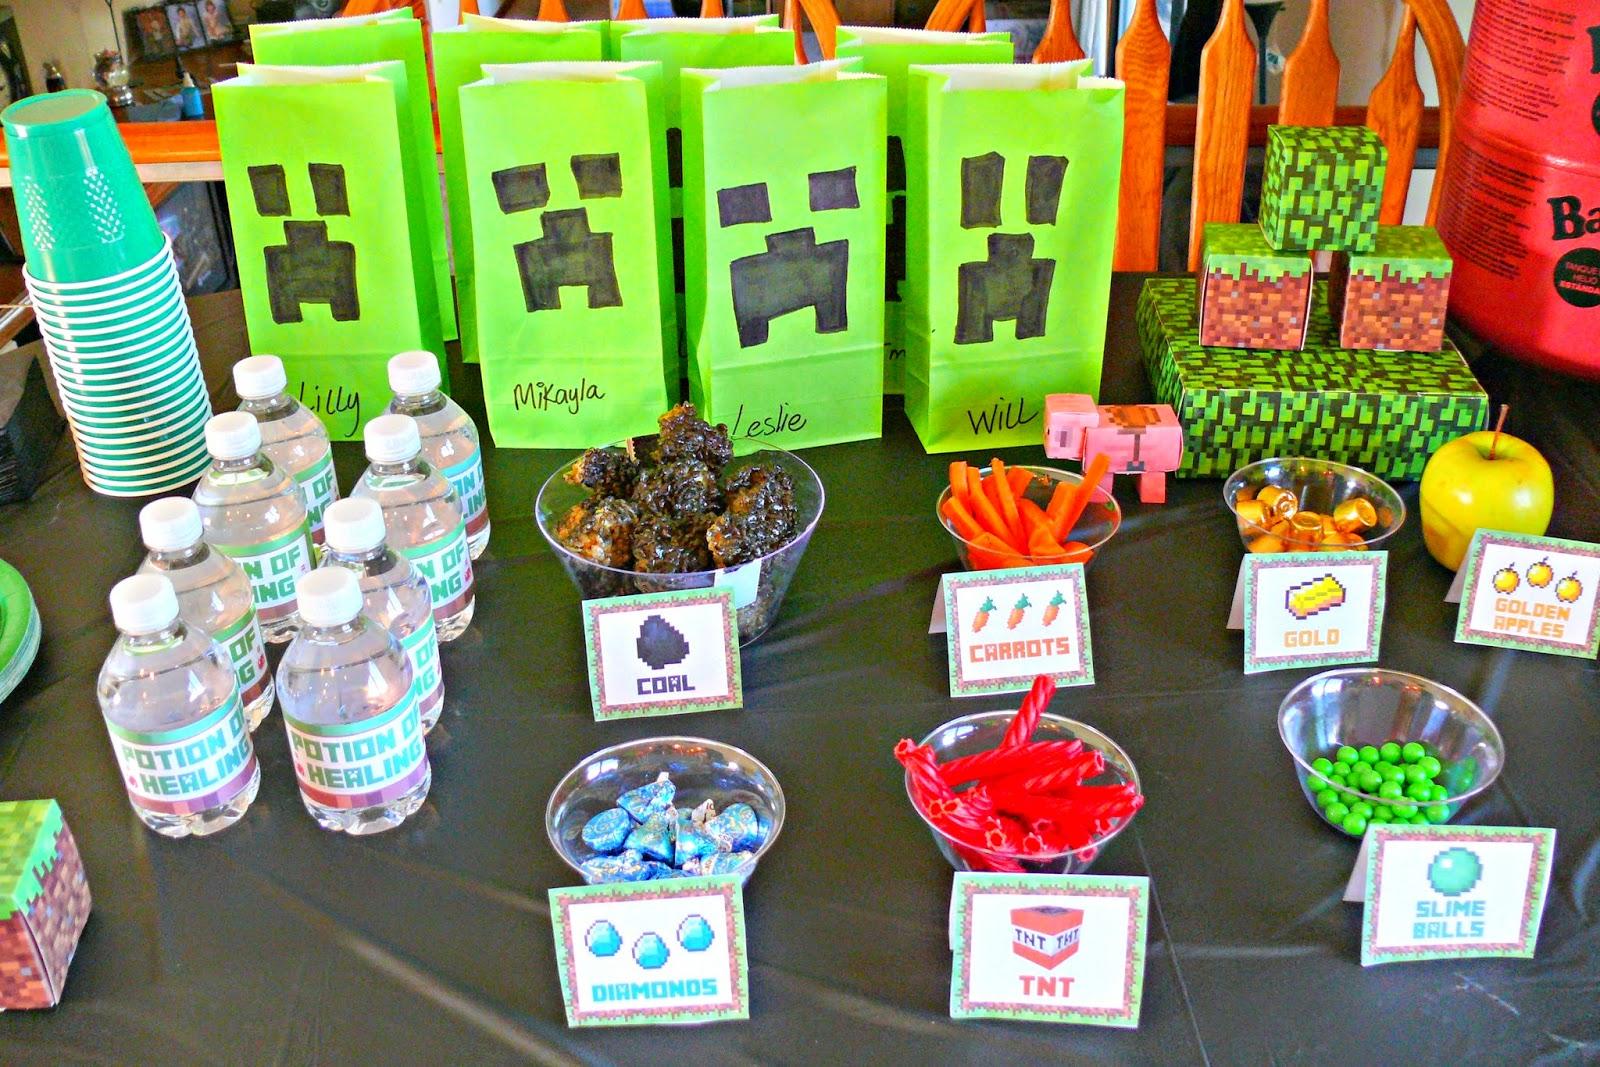 Image Gallery of Minecraft Party Supplies Walmart